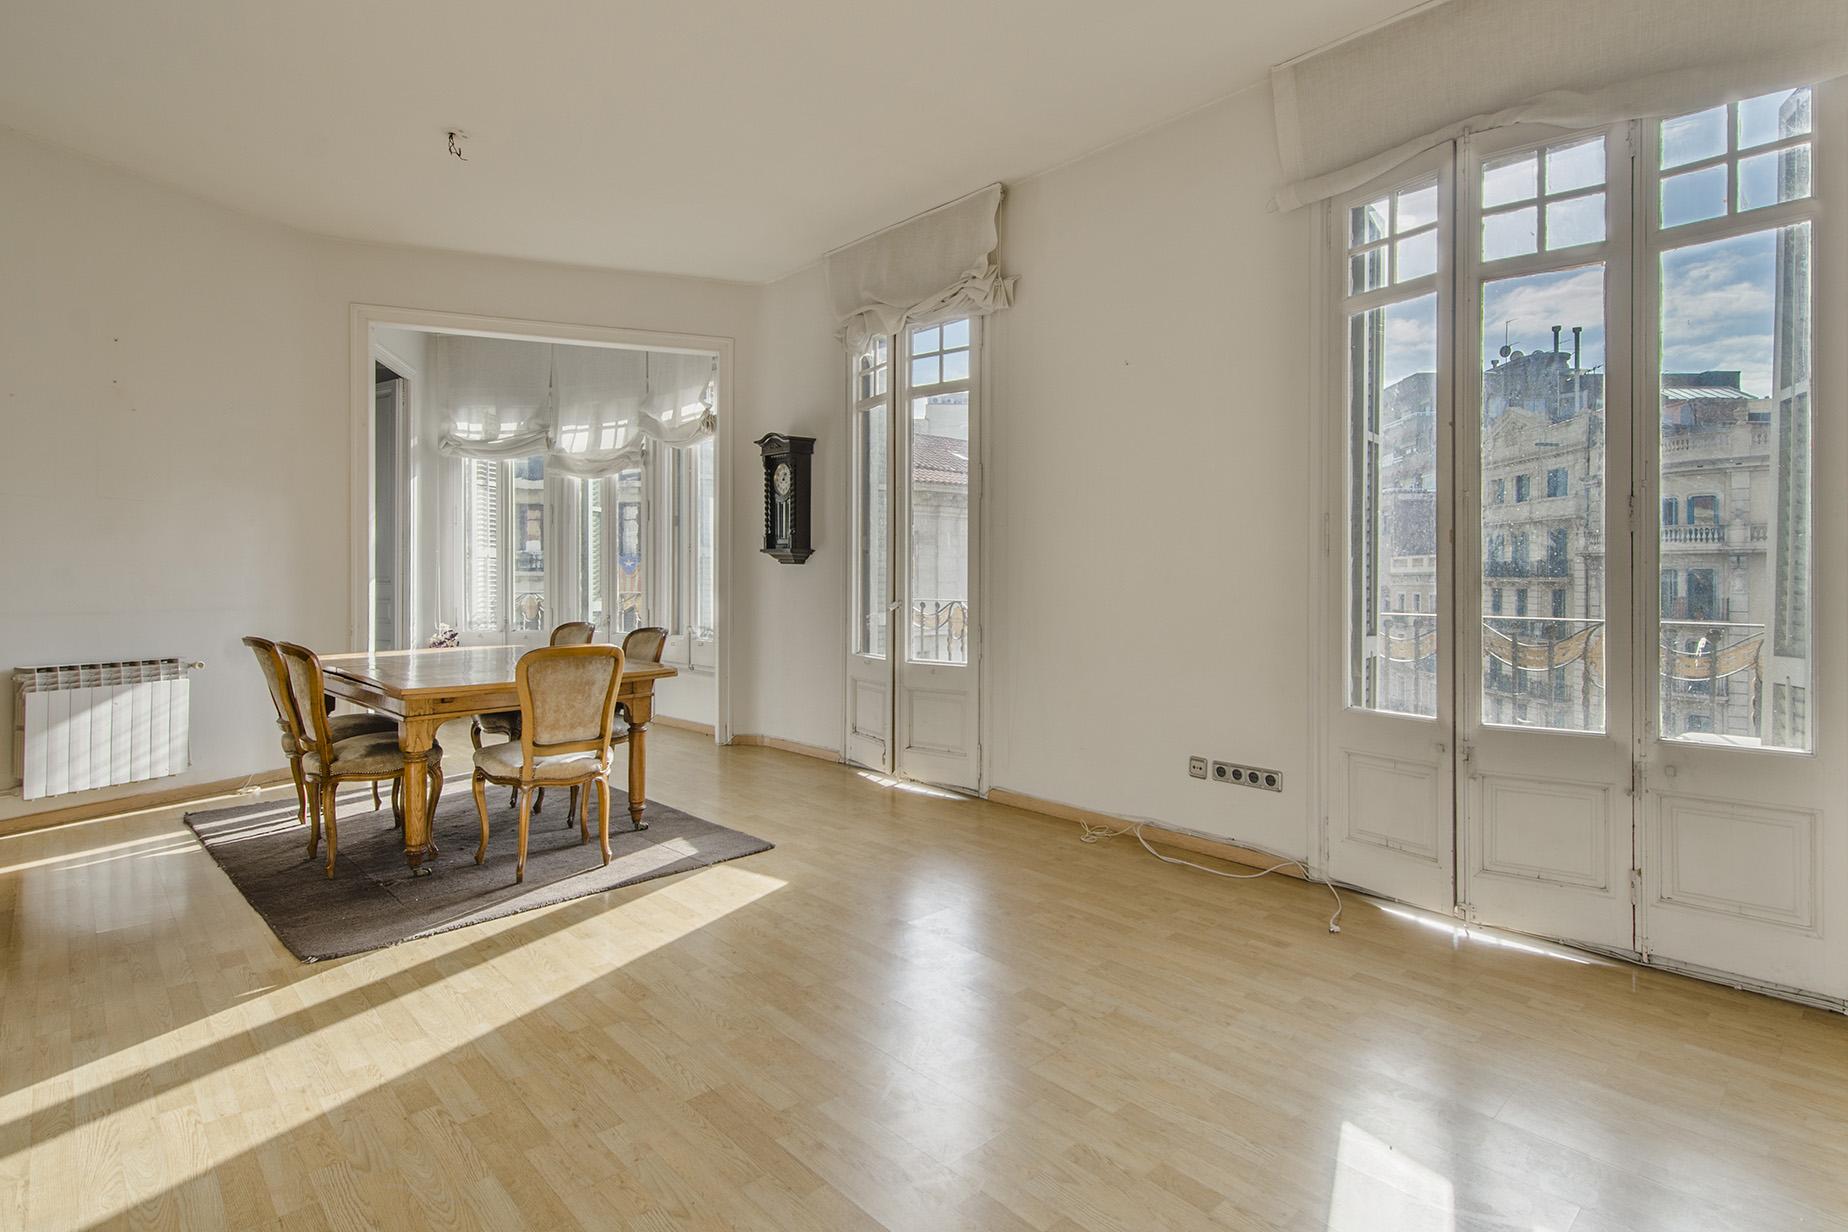 Apartamento para Venda às Splendid Flat in Right Eixample Barcelona City, Barcelona, 08007 Espanha